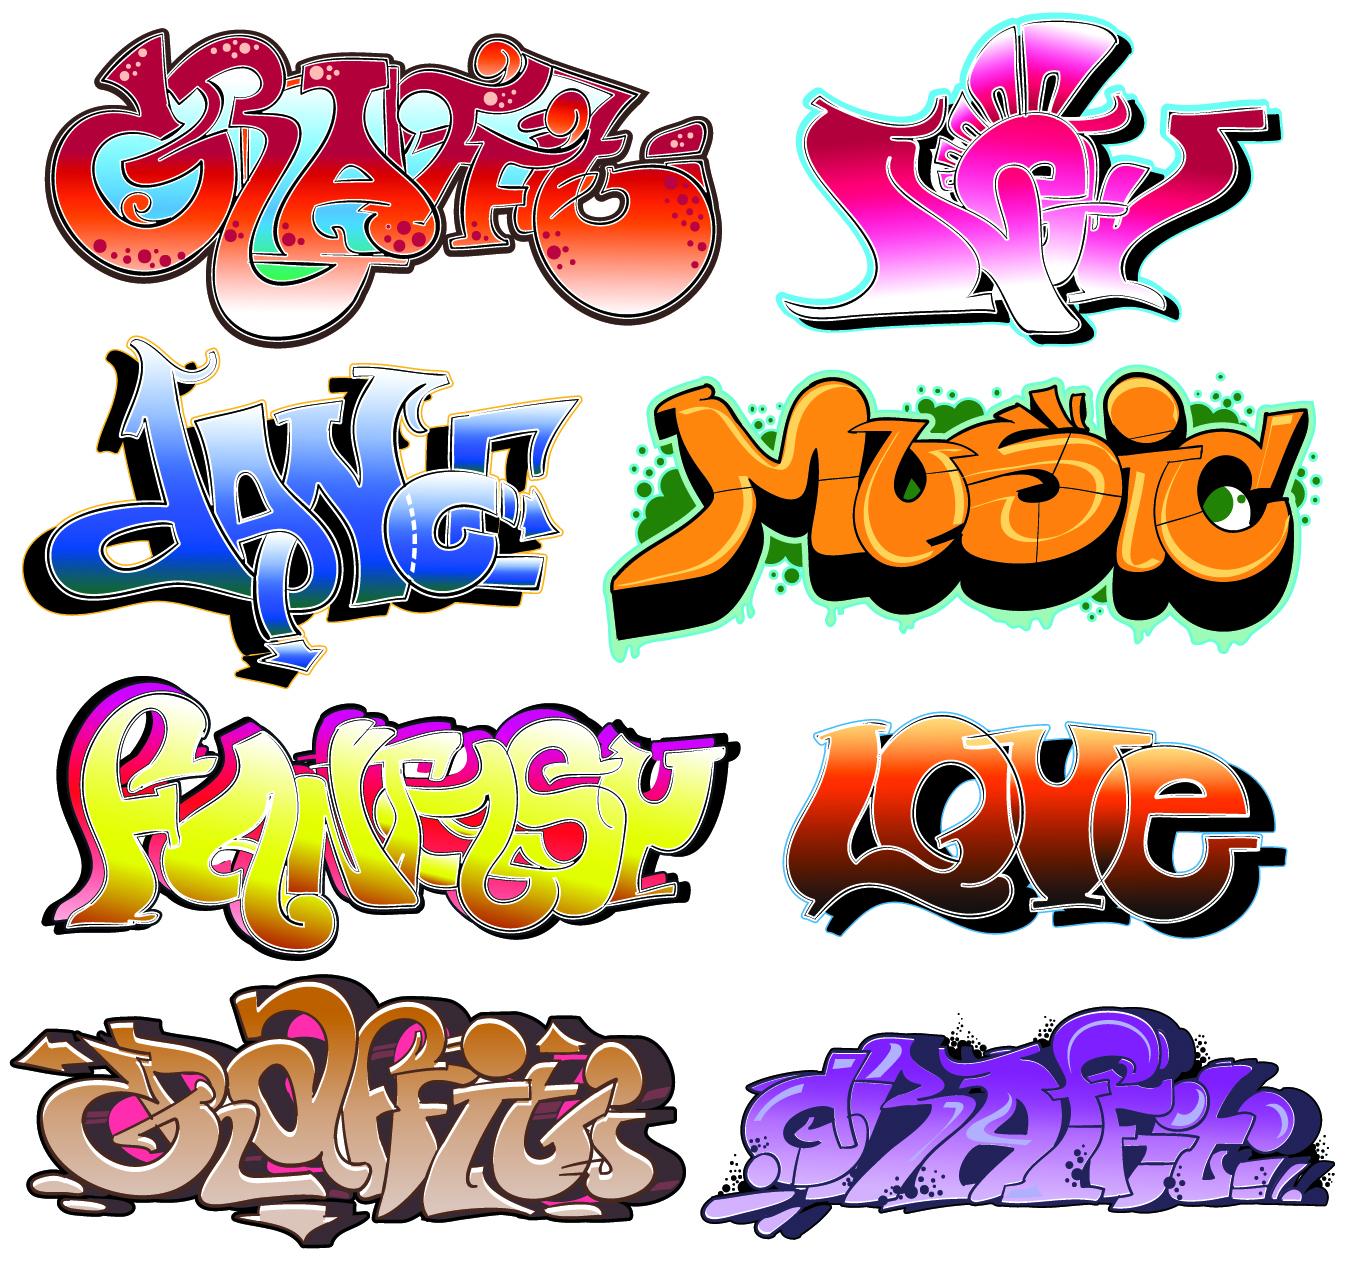 Cool Graffiti Styles and Design